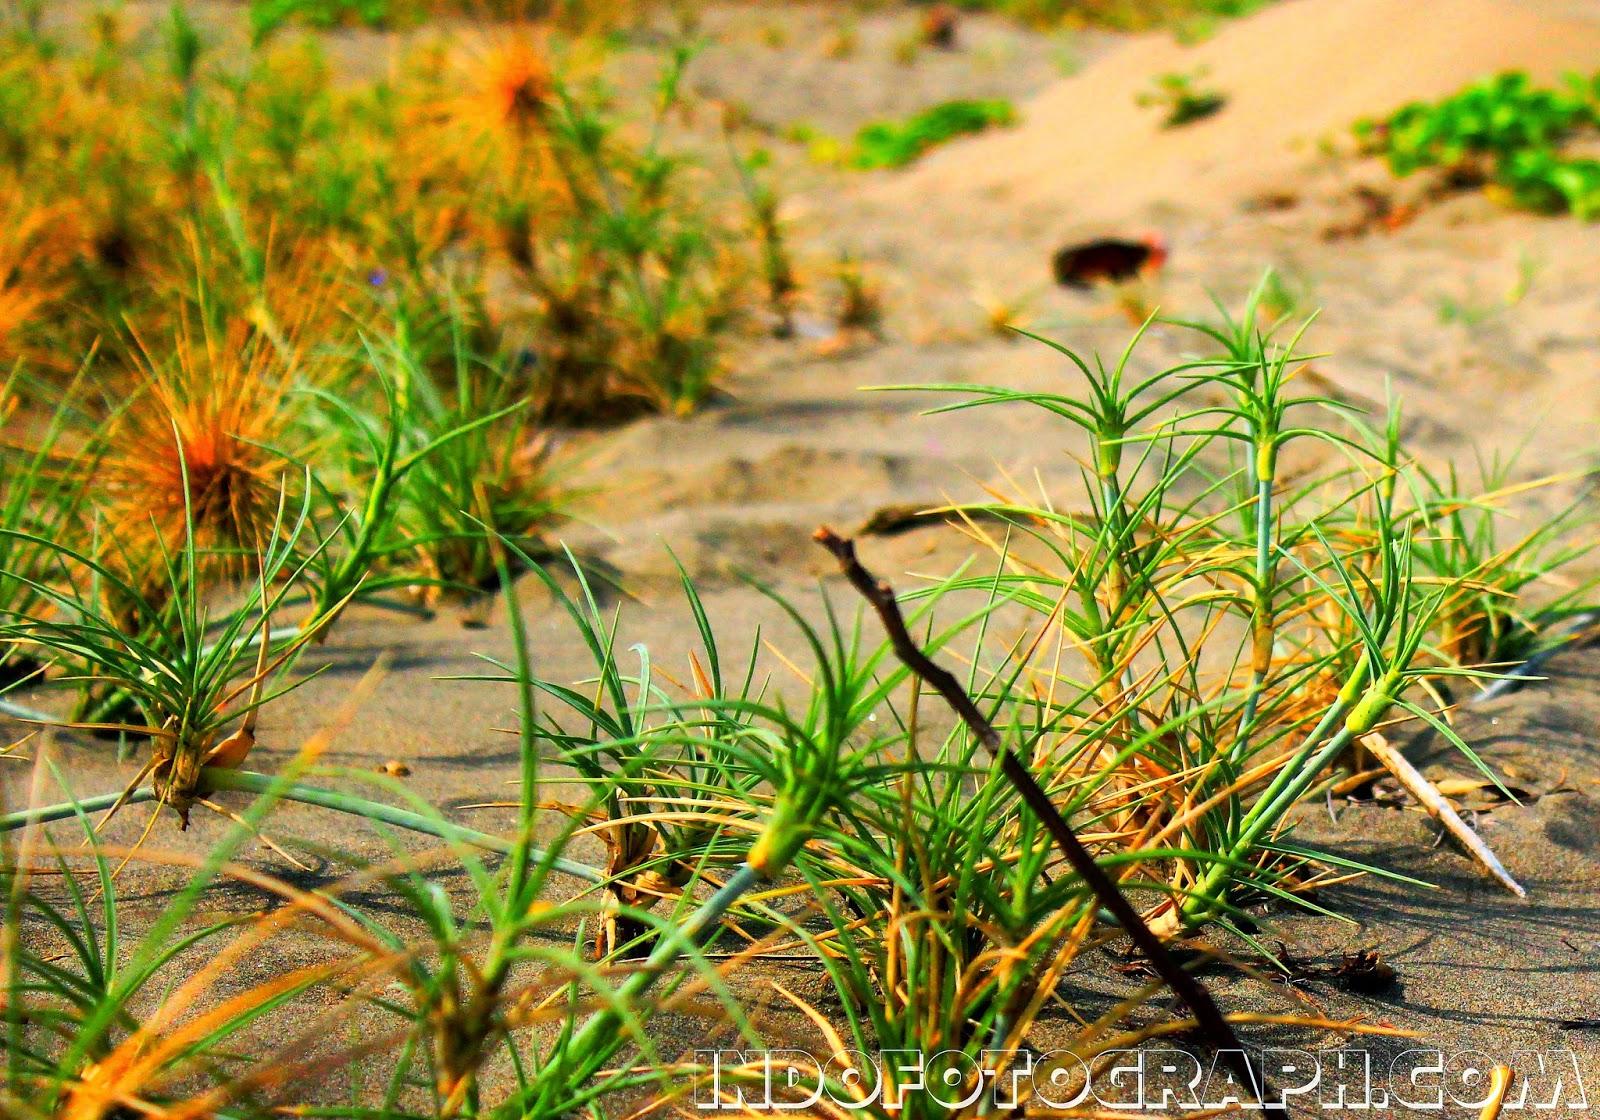 Contoh Hasil Foto Dari Jepretan Kamera DSLR CANON EOS 600D